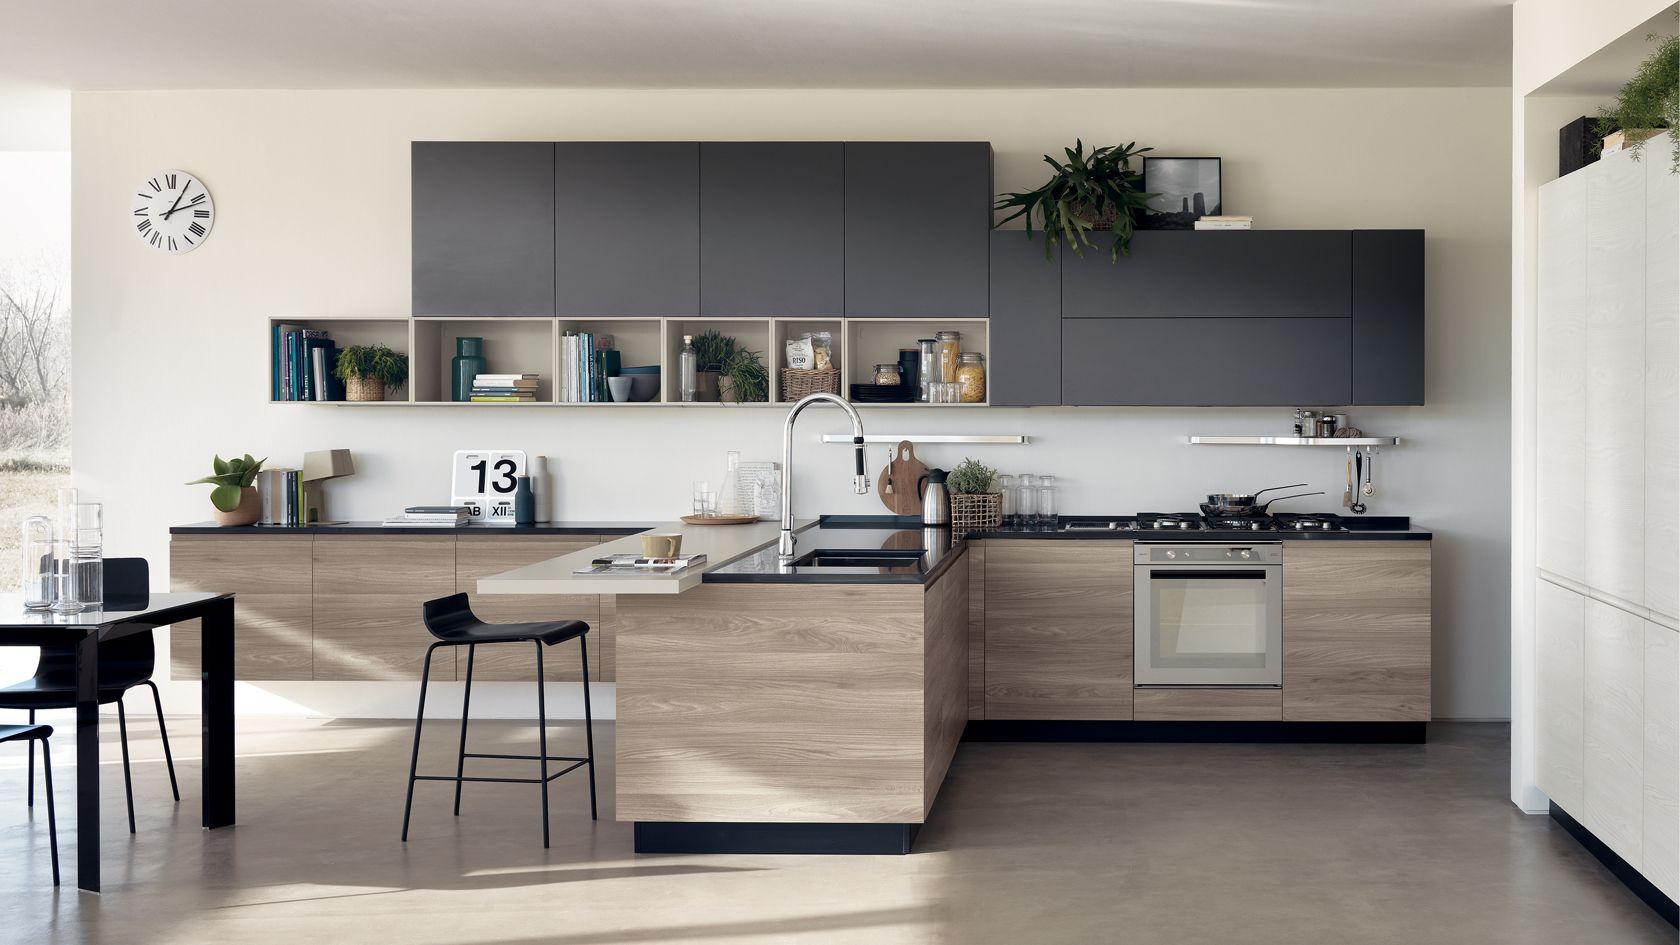 Cucina In Legno Motus Sito Ufficiale Scavolini Arredo Interni Cucina Design Cucine Cucine Moderne